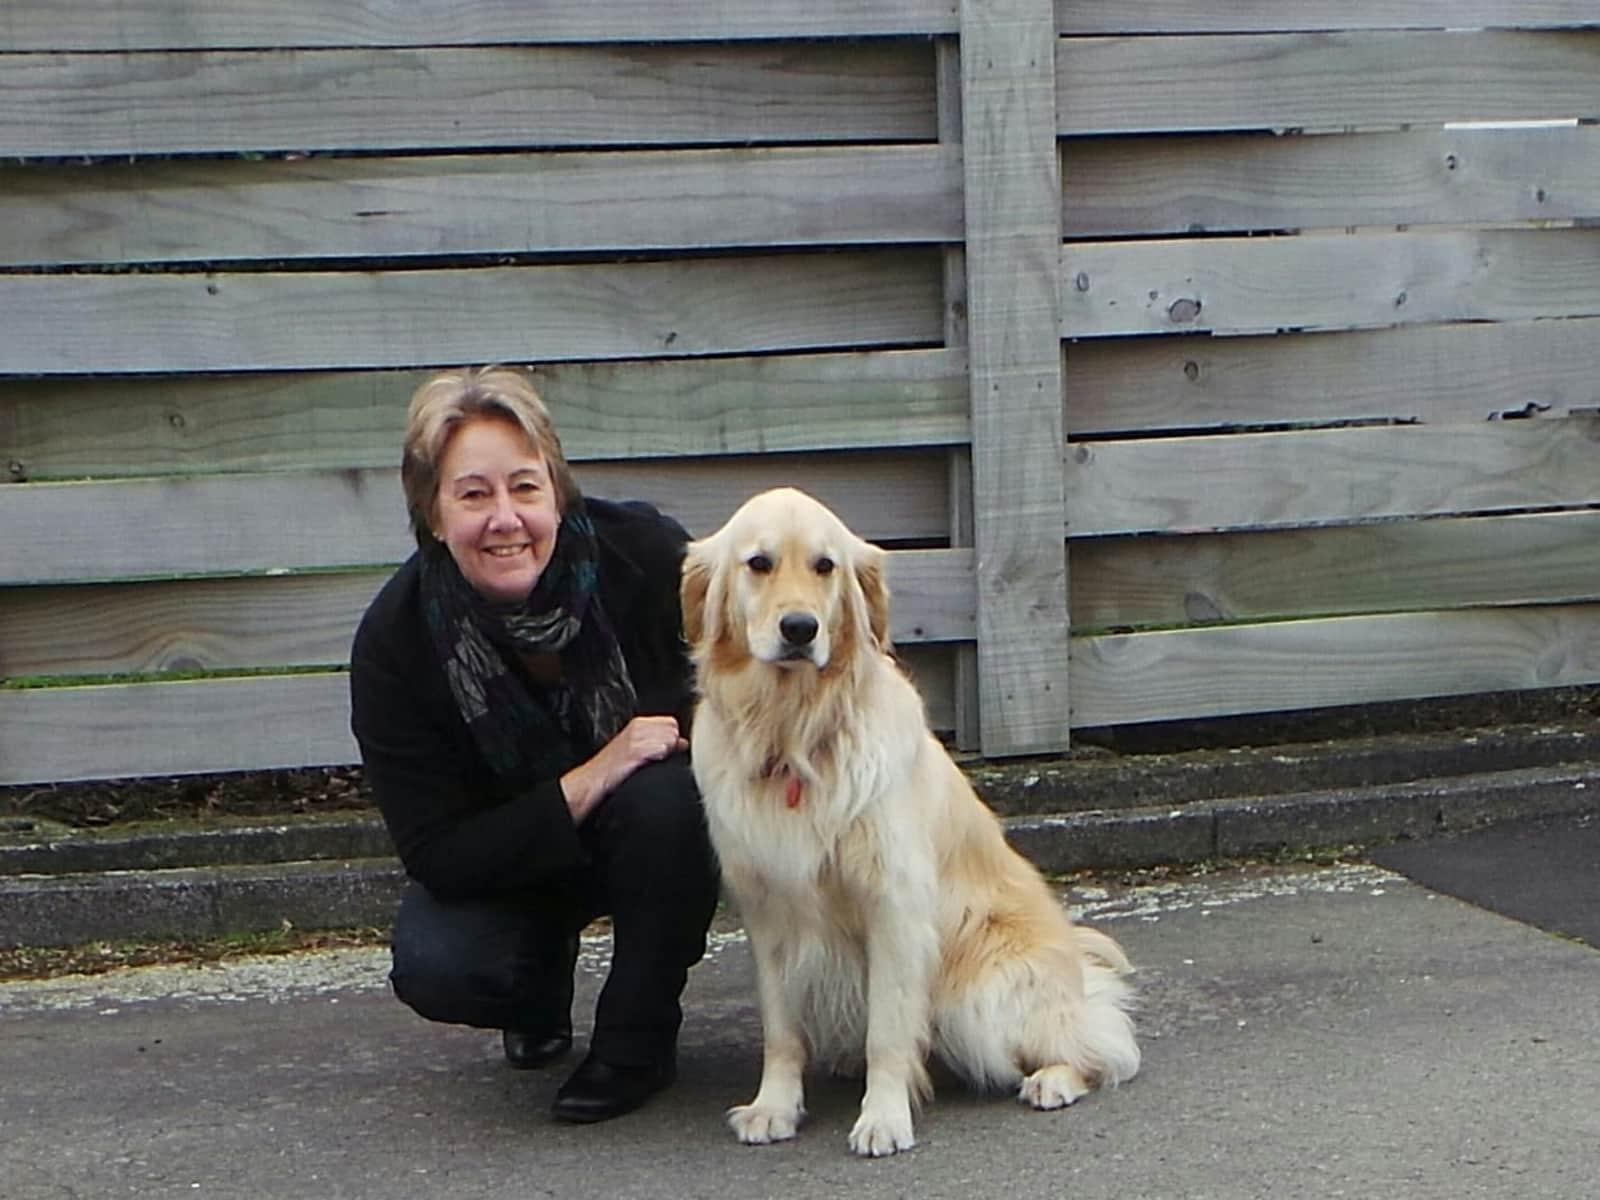 Merinda from Palmerston North, New Zealand